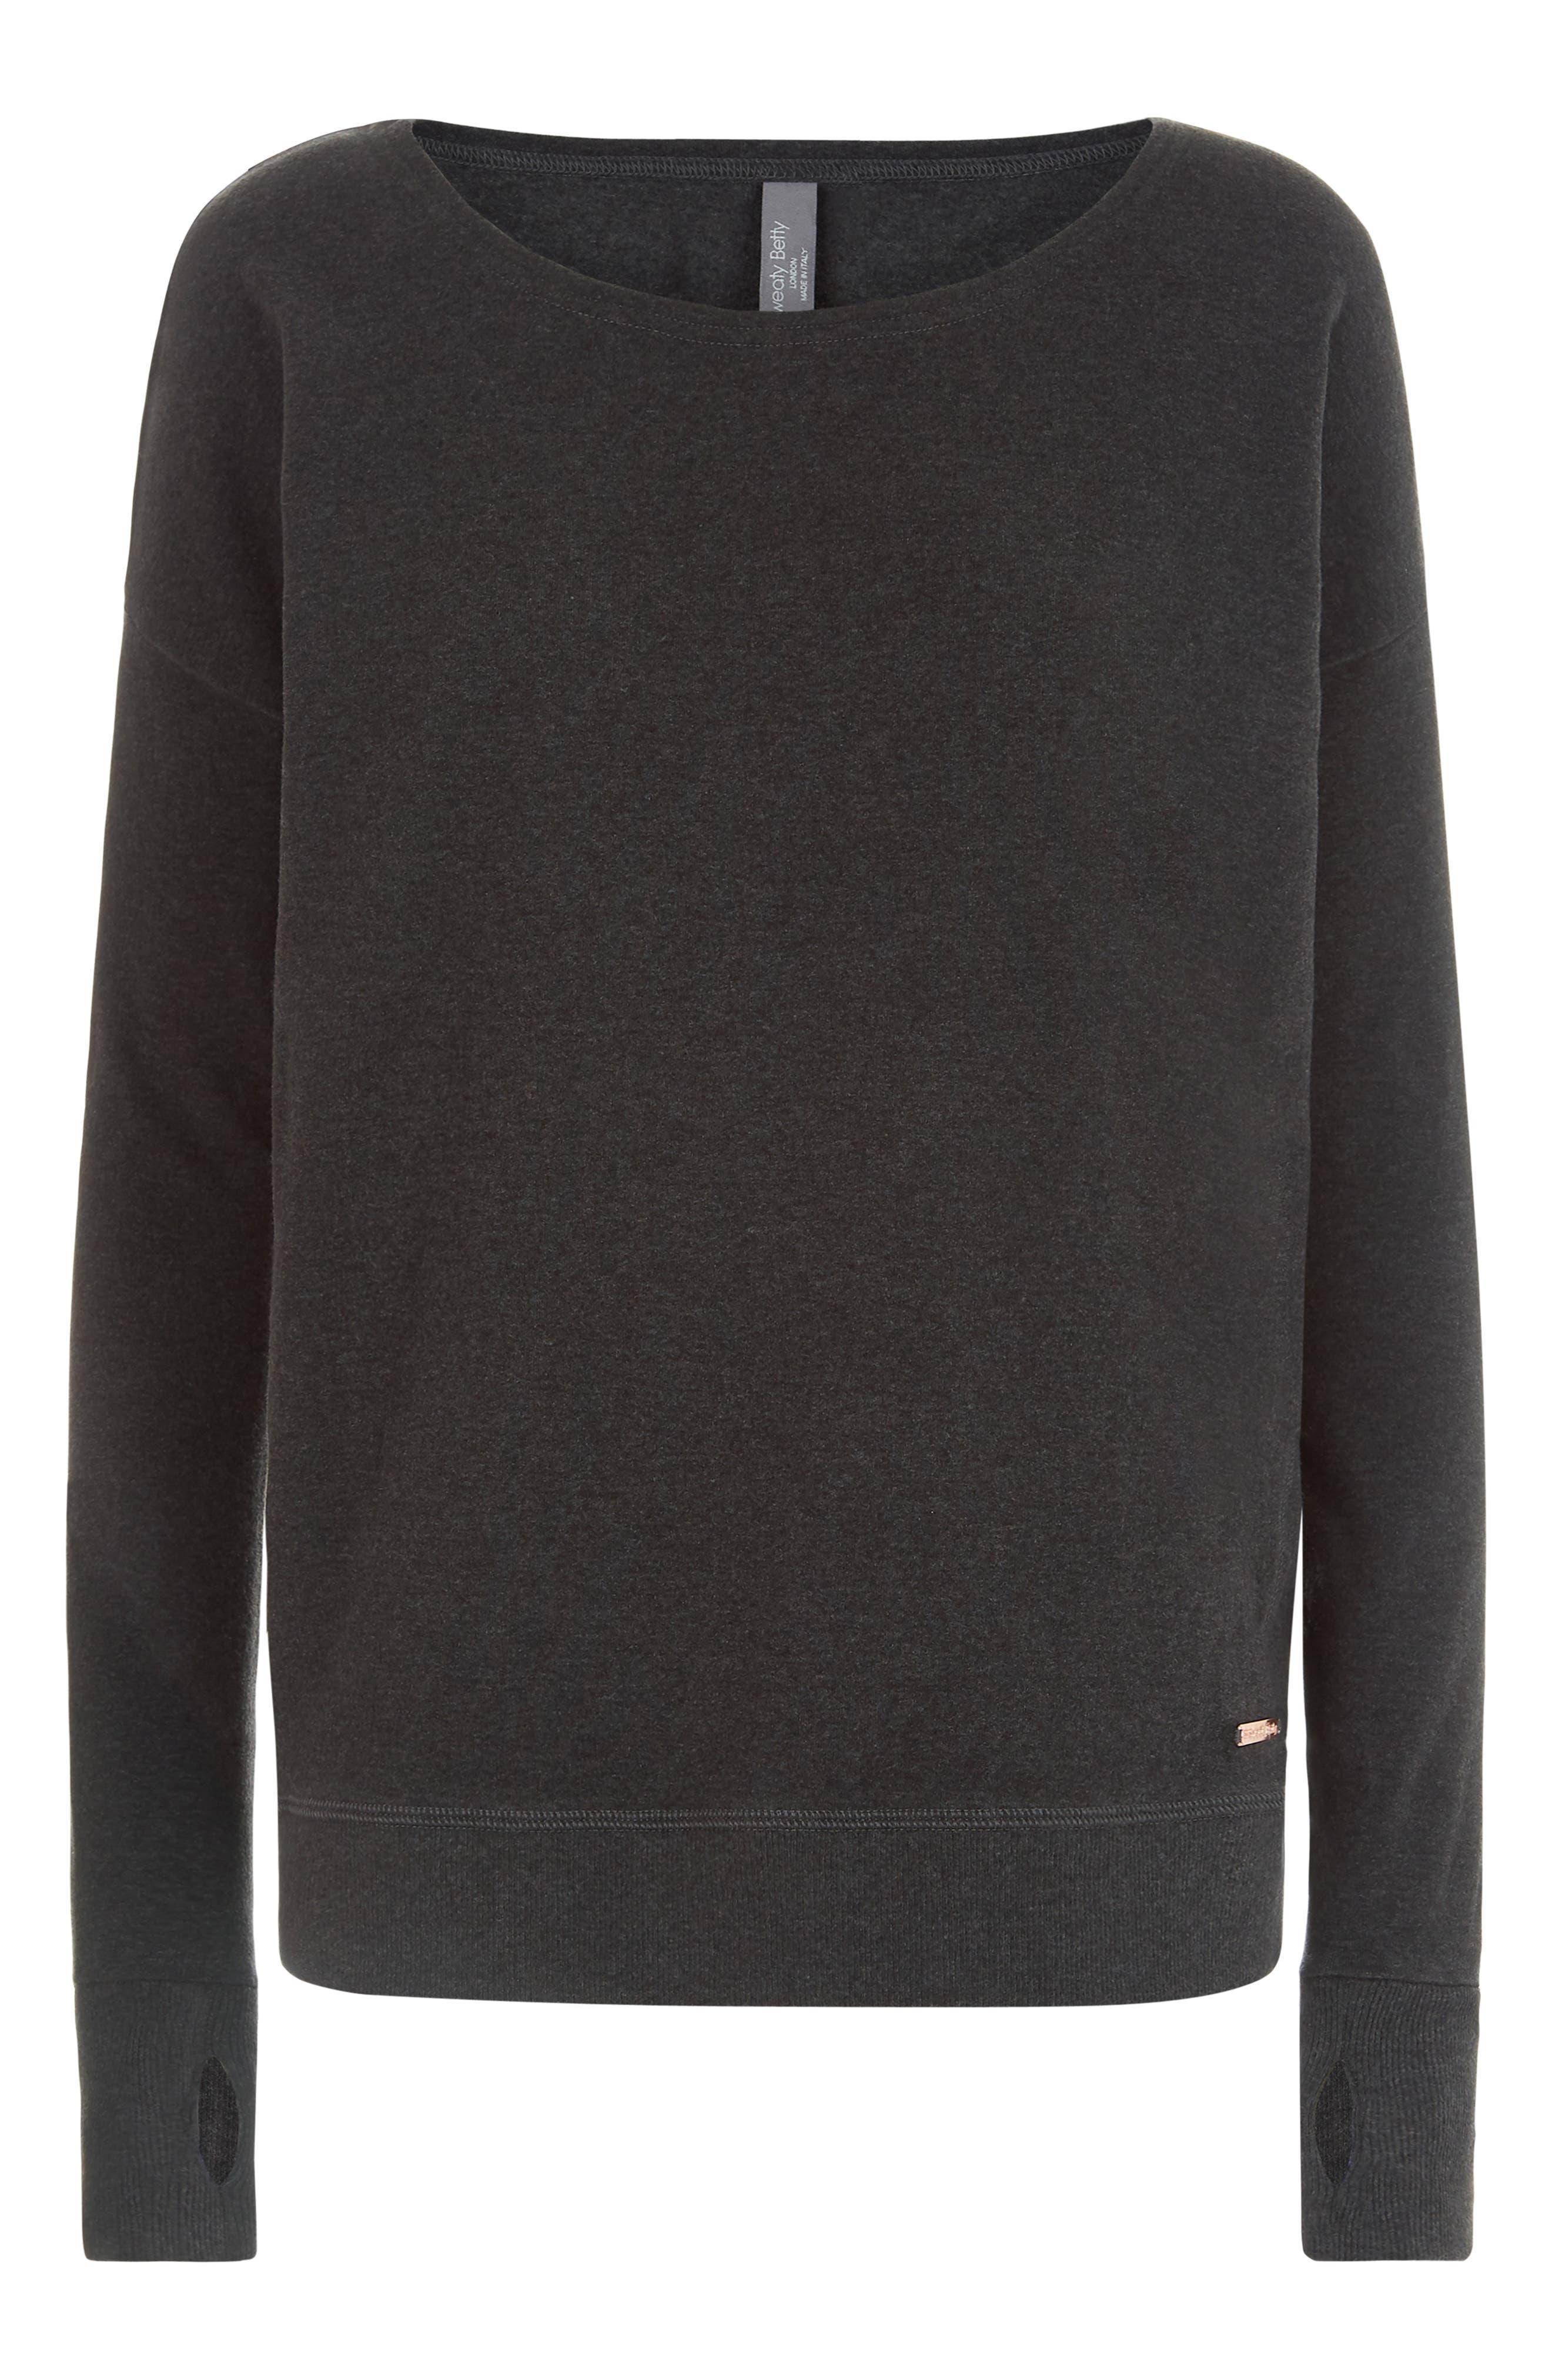 Luxe Simhasana Sweatshirt,                             Alternate thumbnail 5, color,                             BLACK MARL